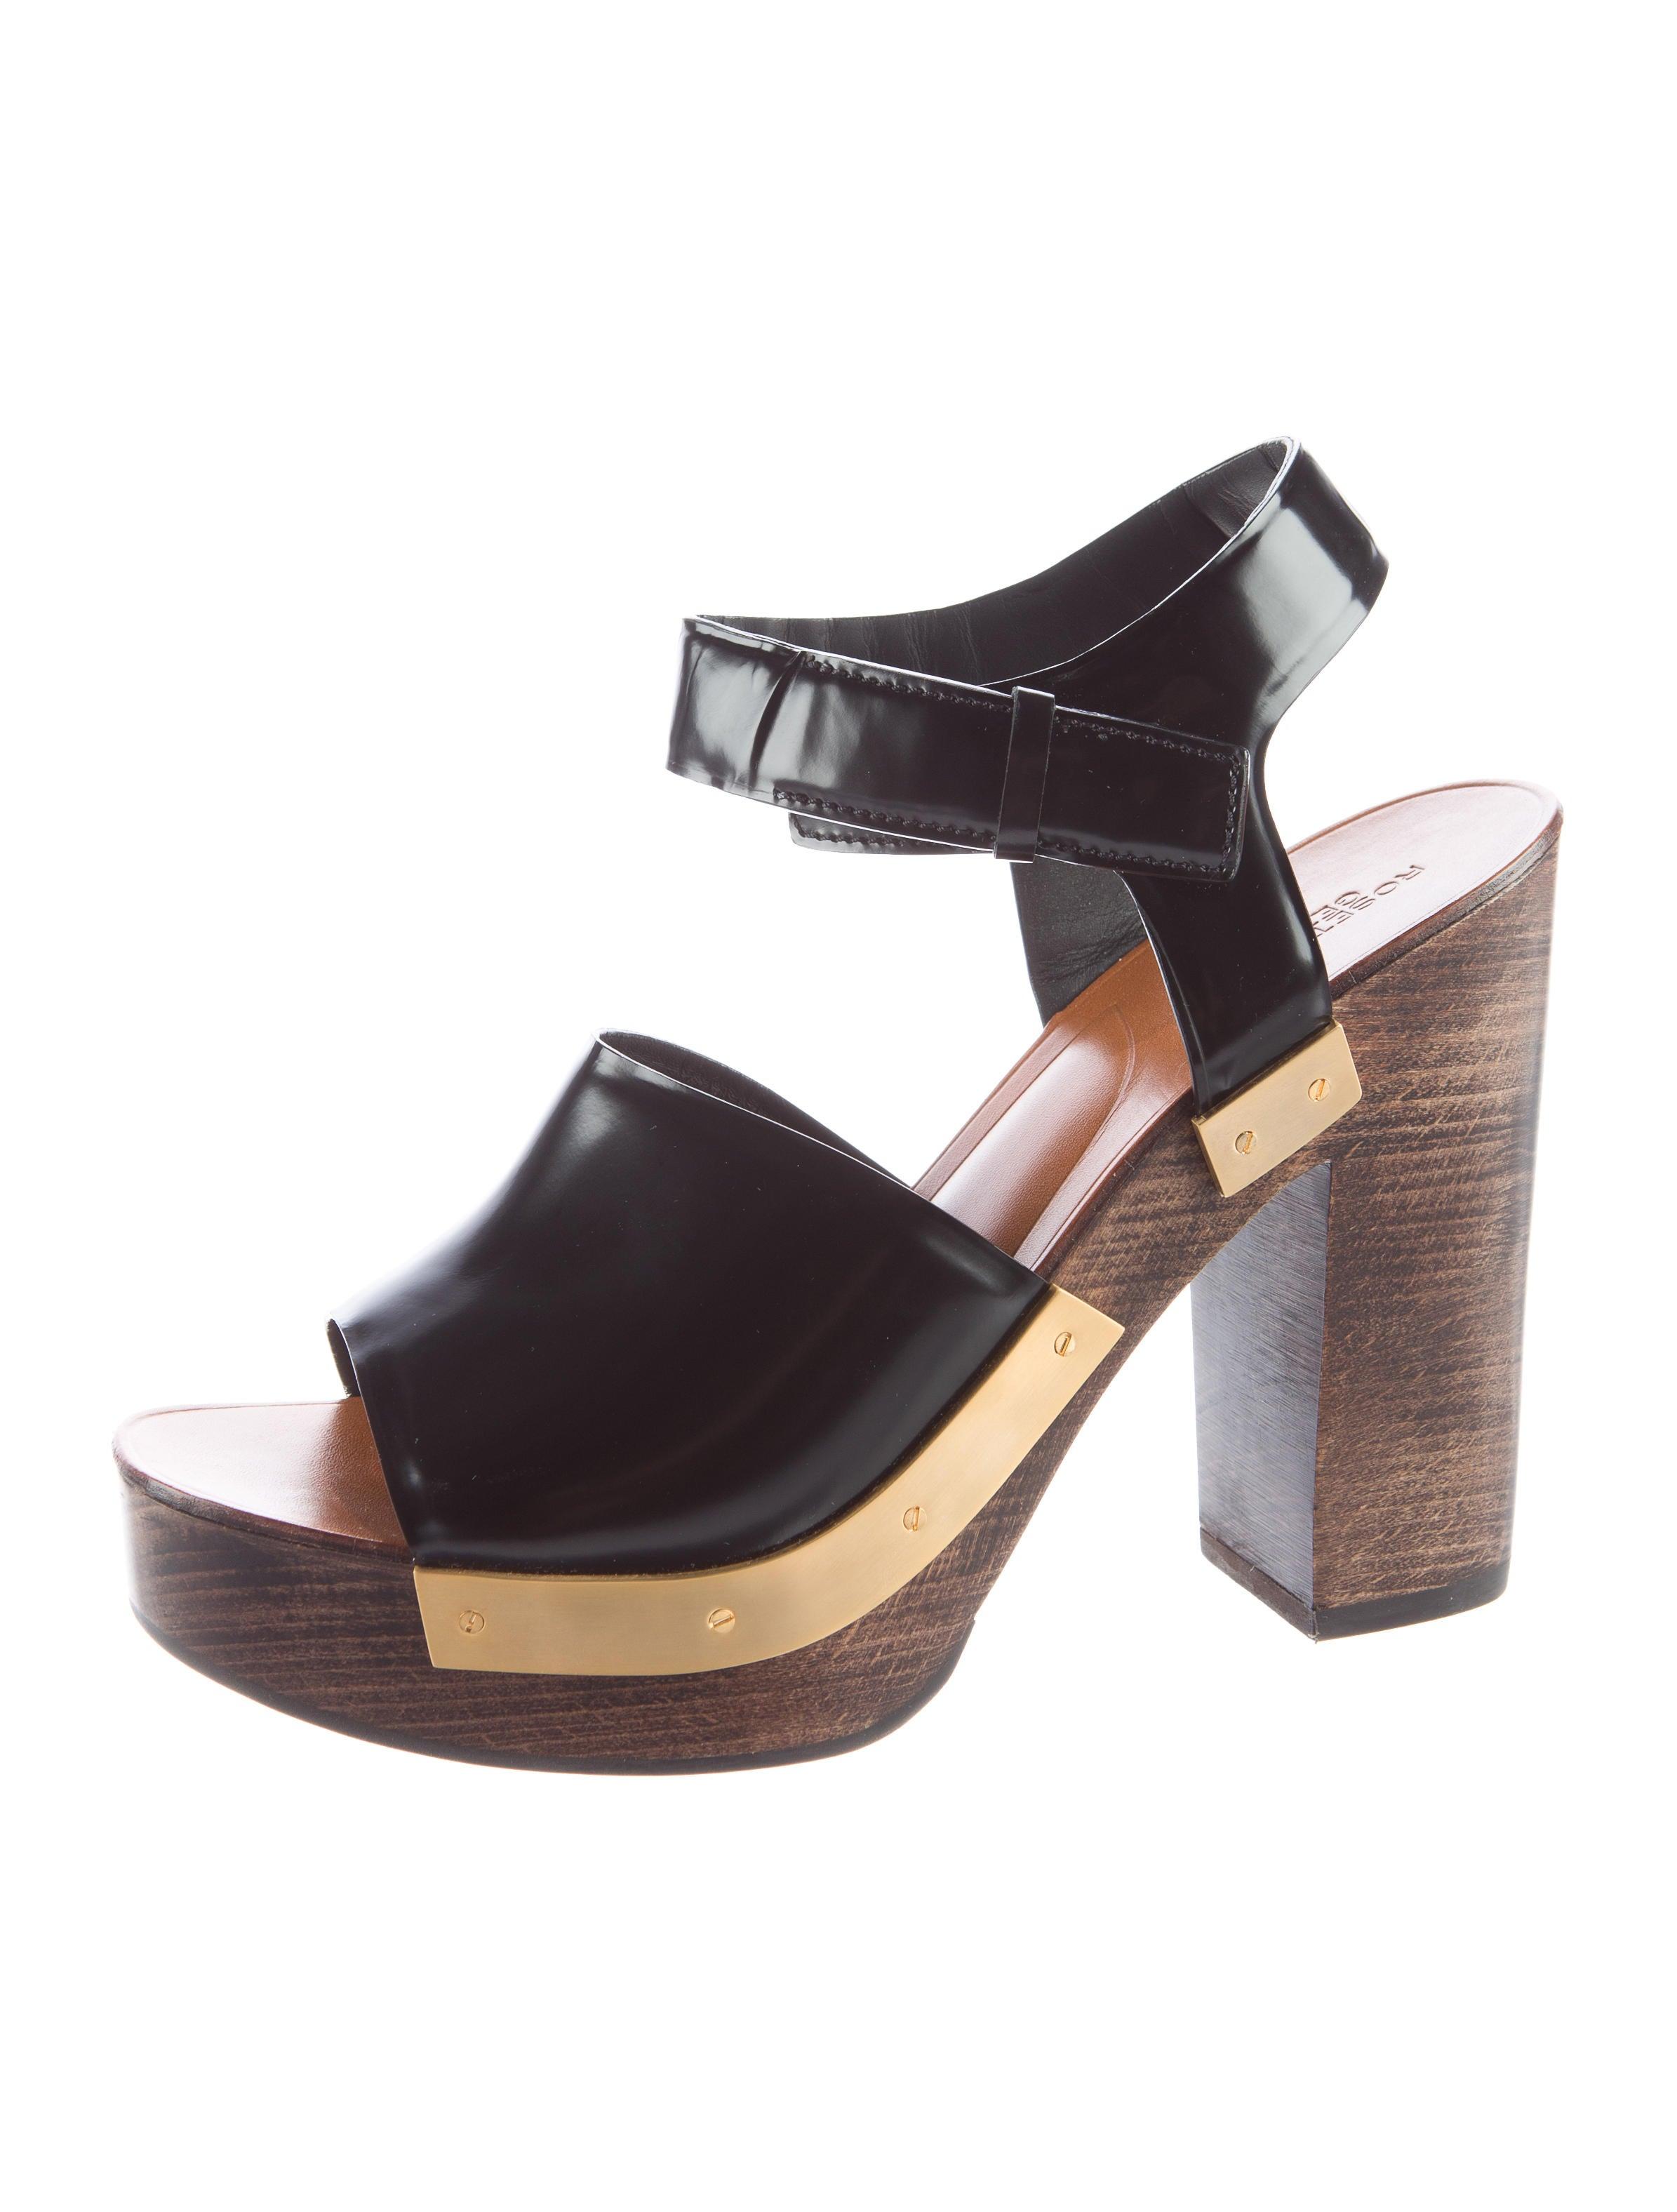 rosetta getty platform ankle sandals shoes